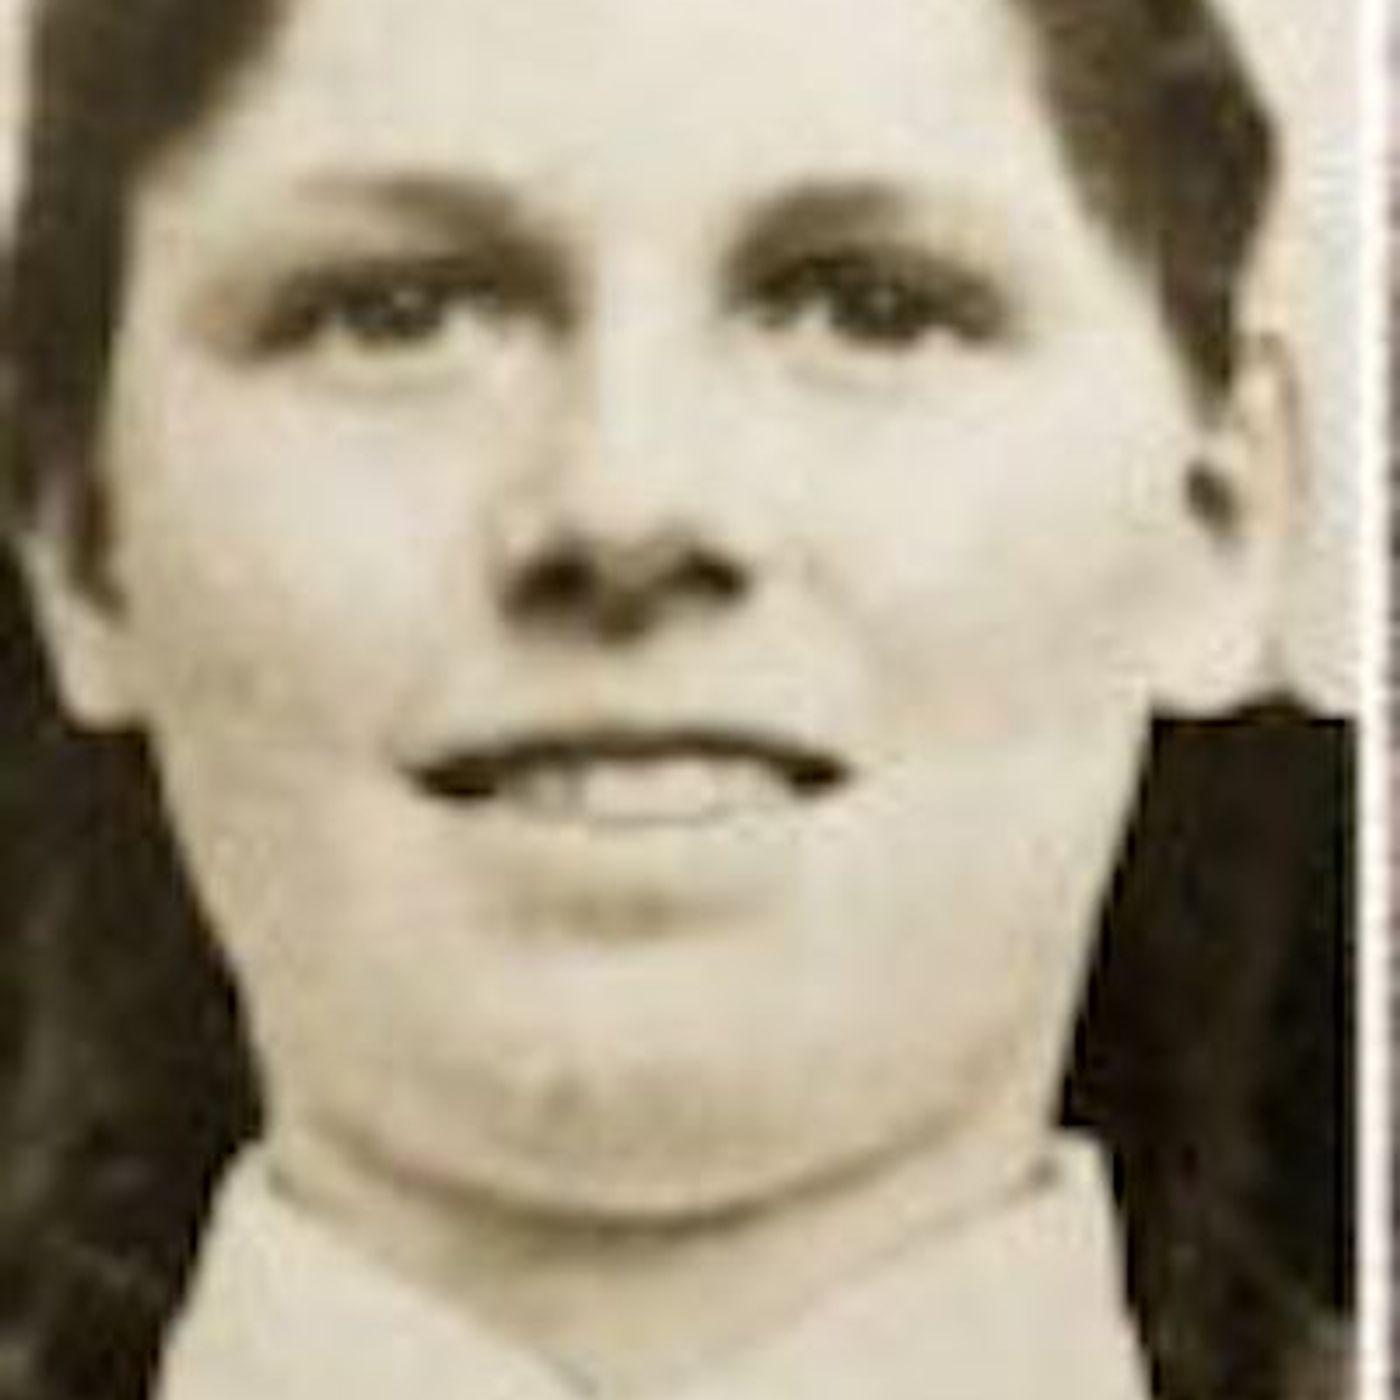 L'assassinio di Muriel Drinkwater